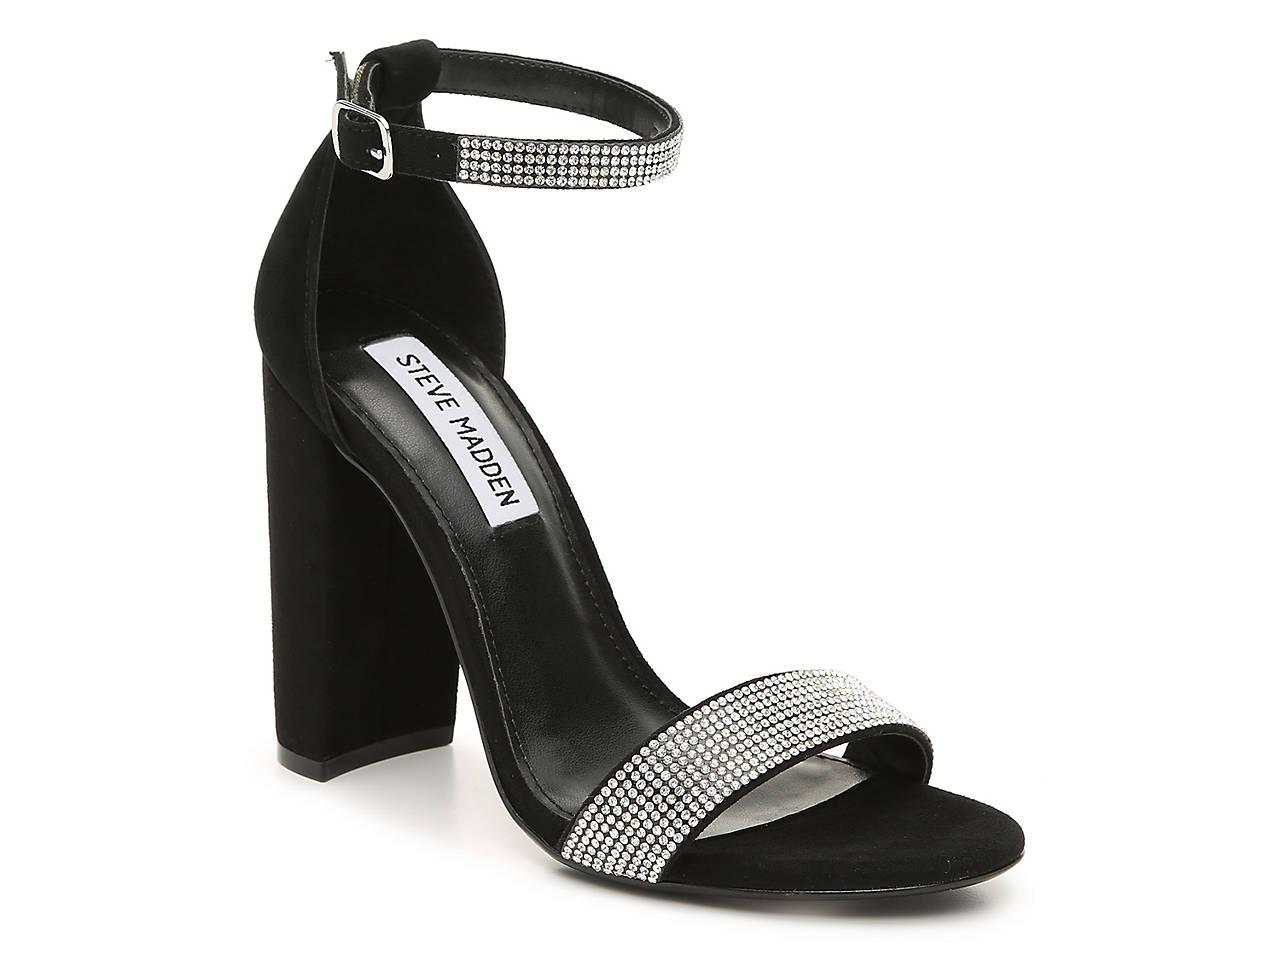 8f278d180b6 Steve Madden Kalina Sandal Women s Shoes